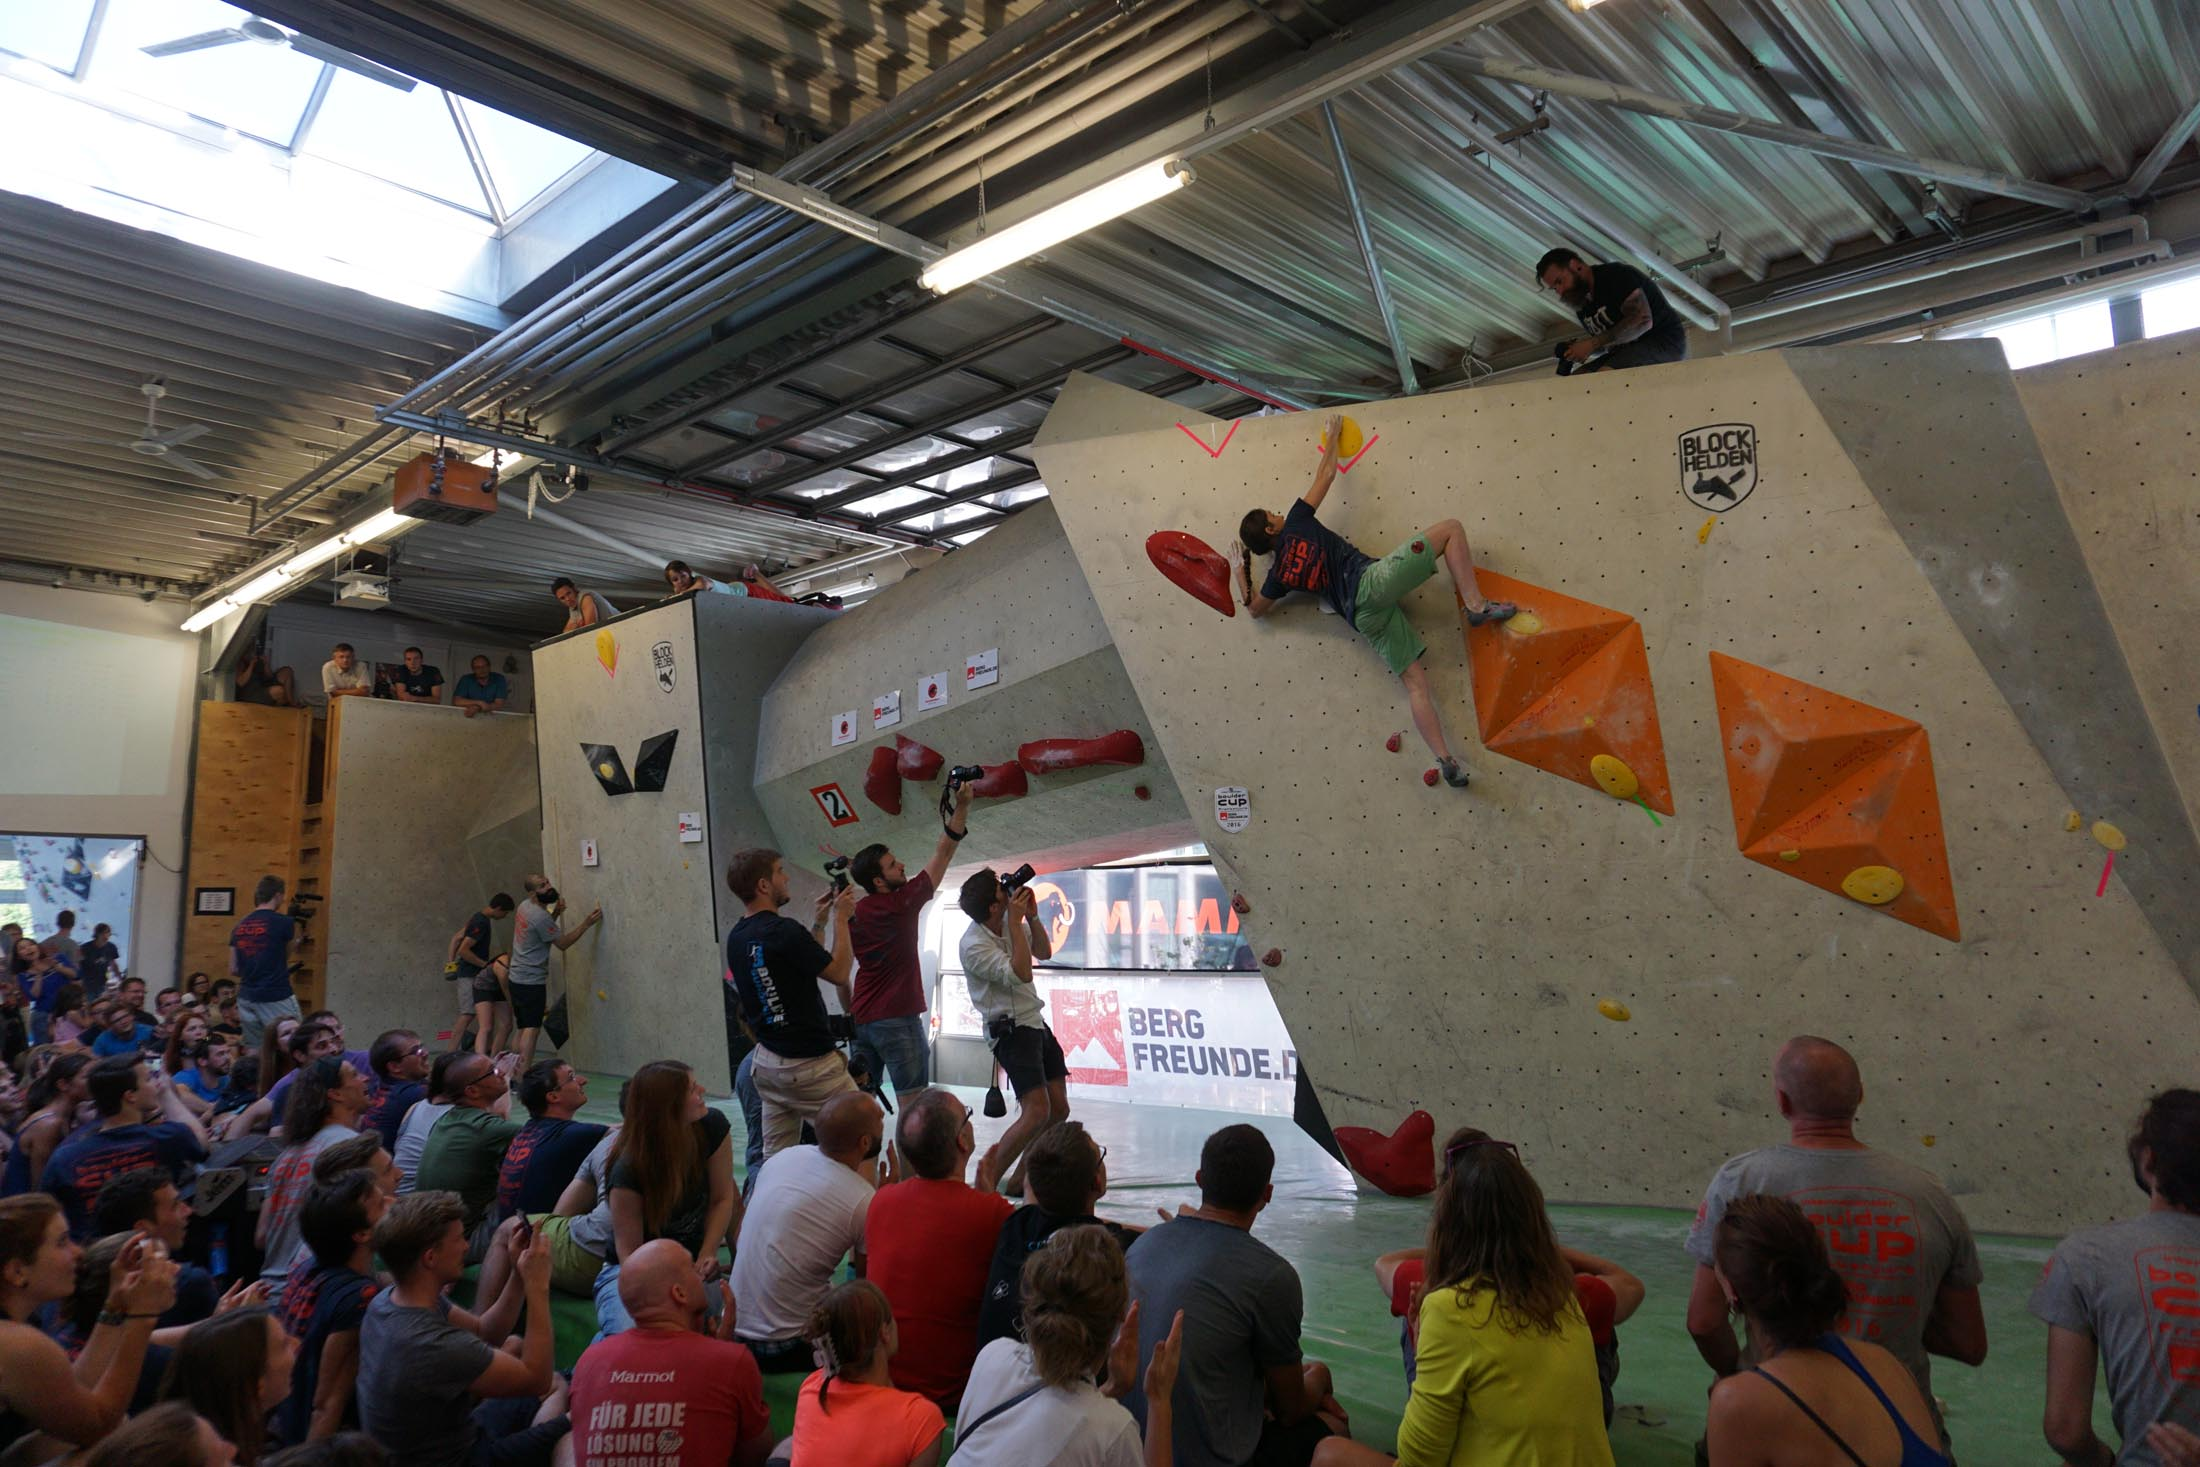 Finale, internationaler bouldercup Frankenjura 2016, BLOCKHELDEN Erlangen, Mammut, Bergfreunde.de, Boulderwettkampf07092016531